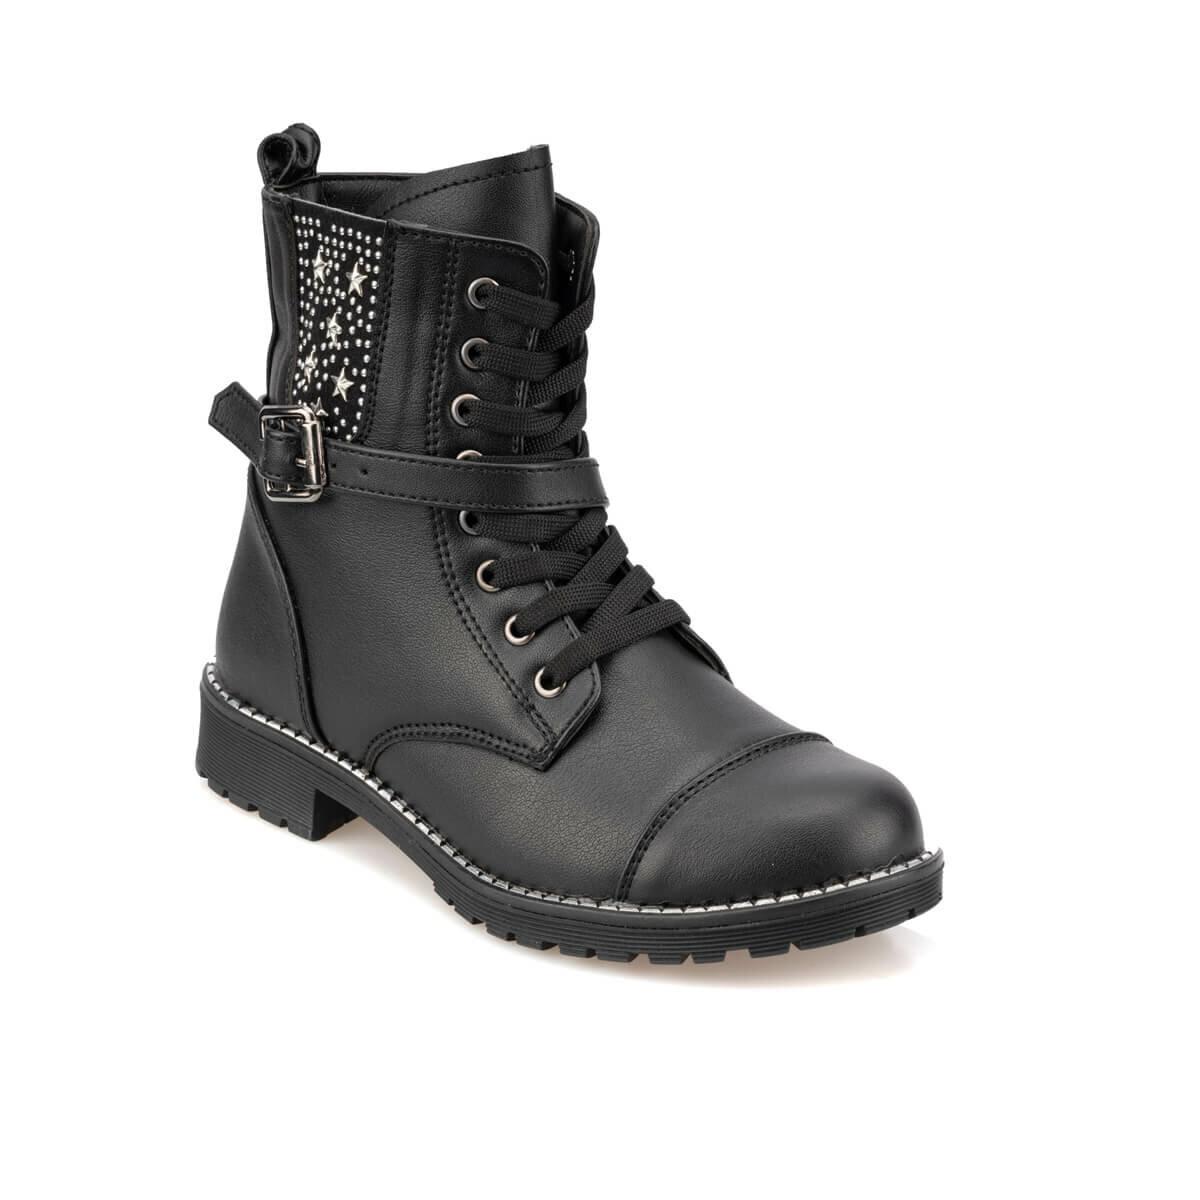 FLO 92. 511814.F Burgundy Female Child Boots Polaris